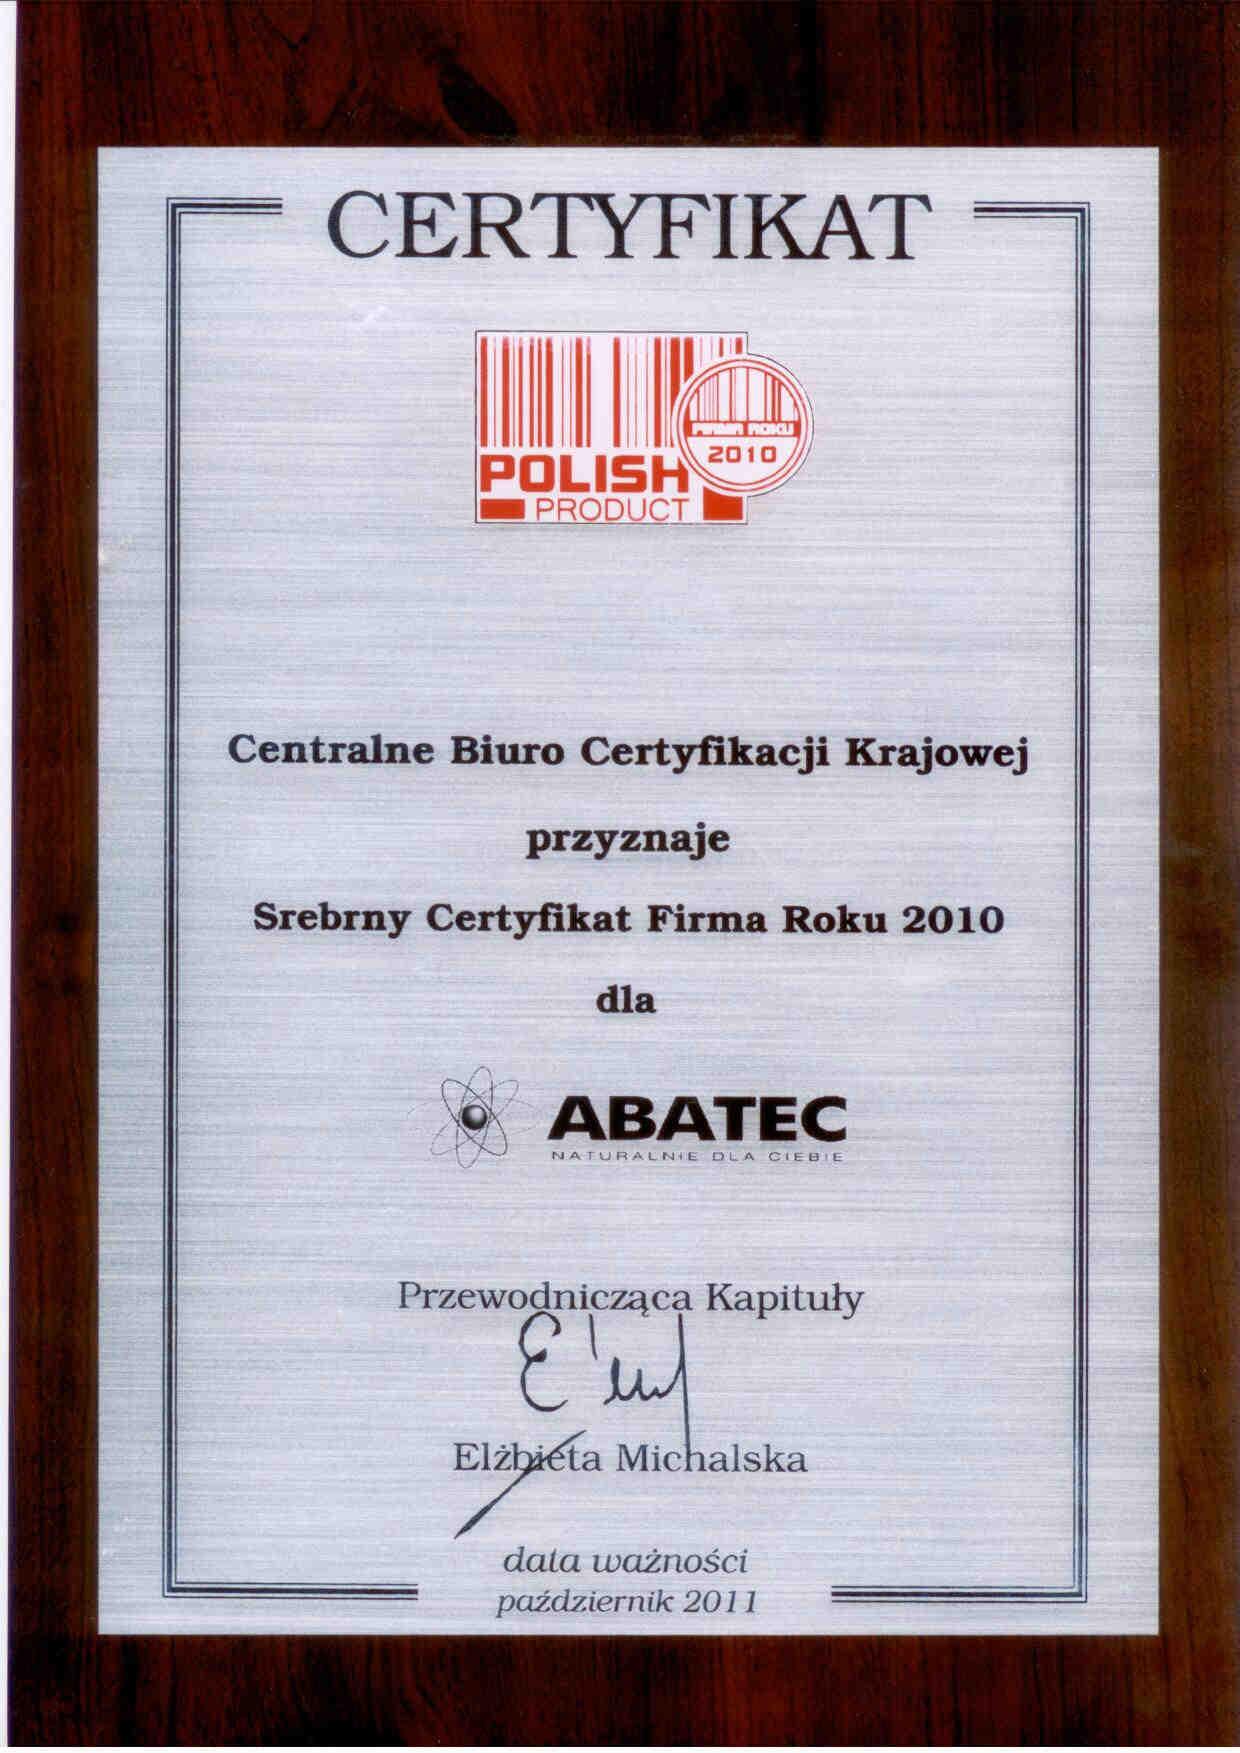 abatec certyfikat polish product 2010